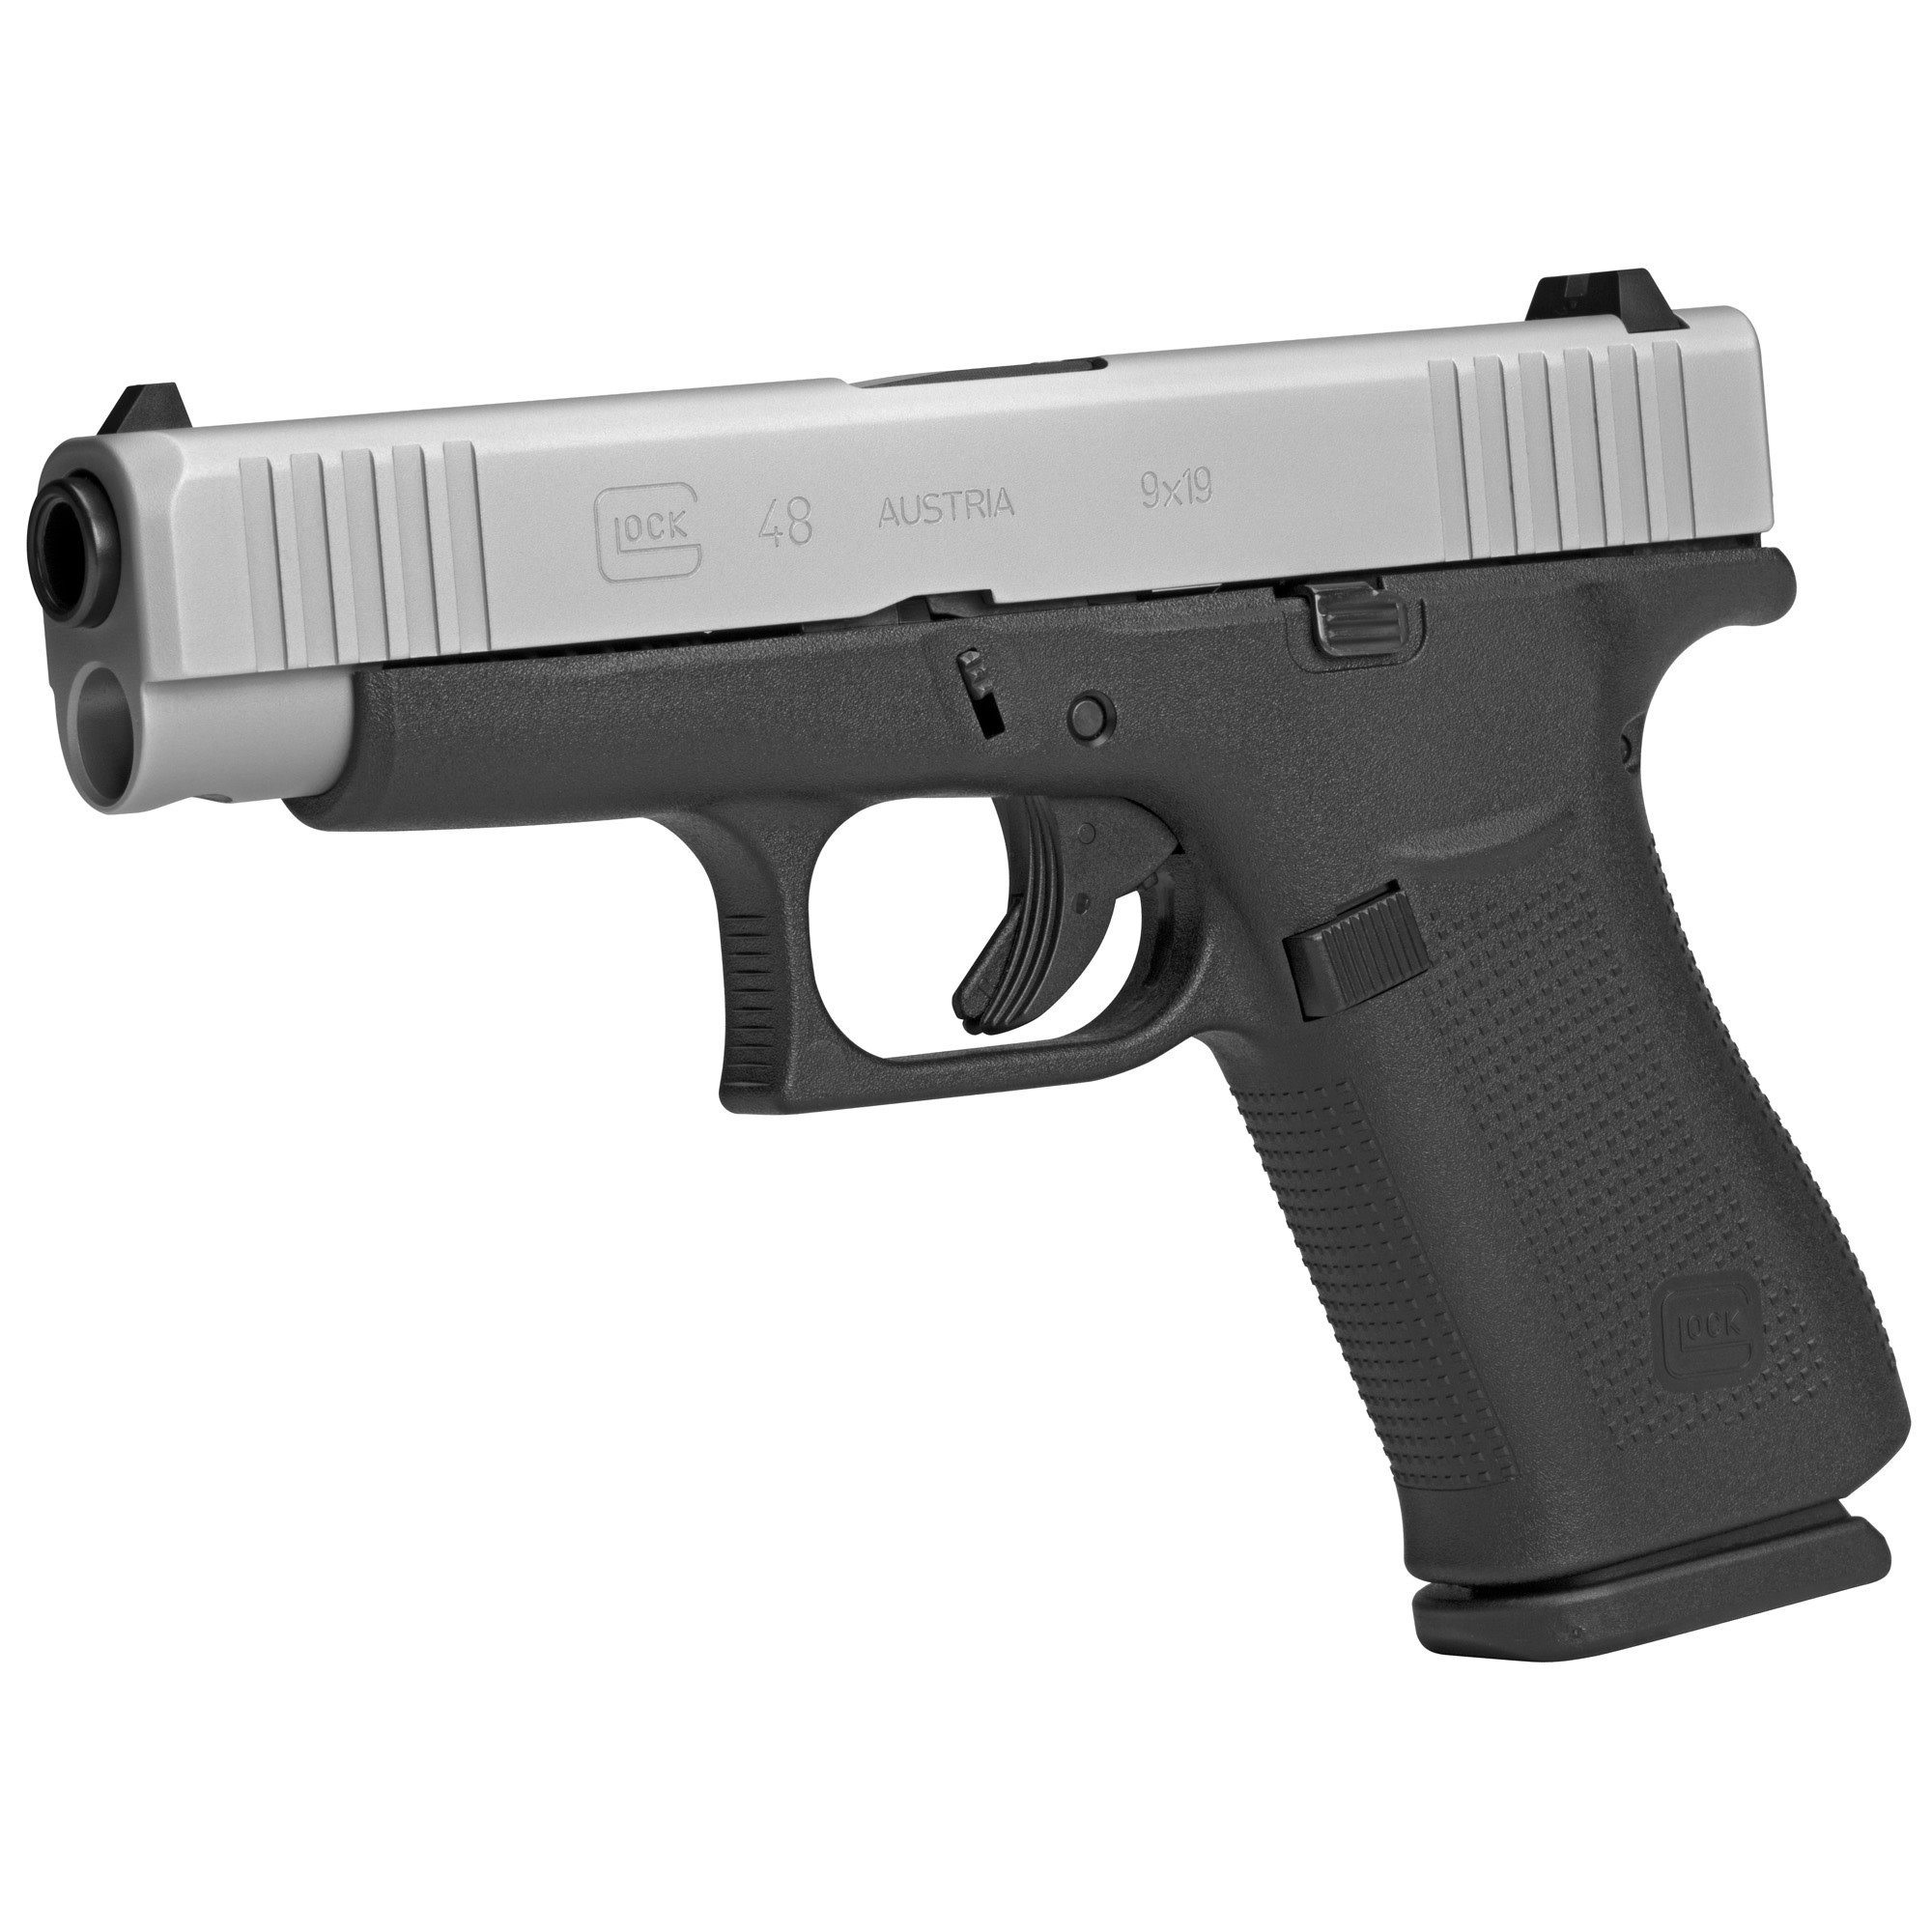 Glock Glock G48 9mm